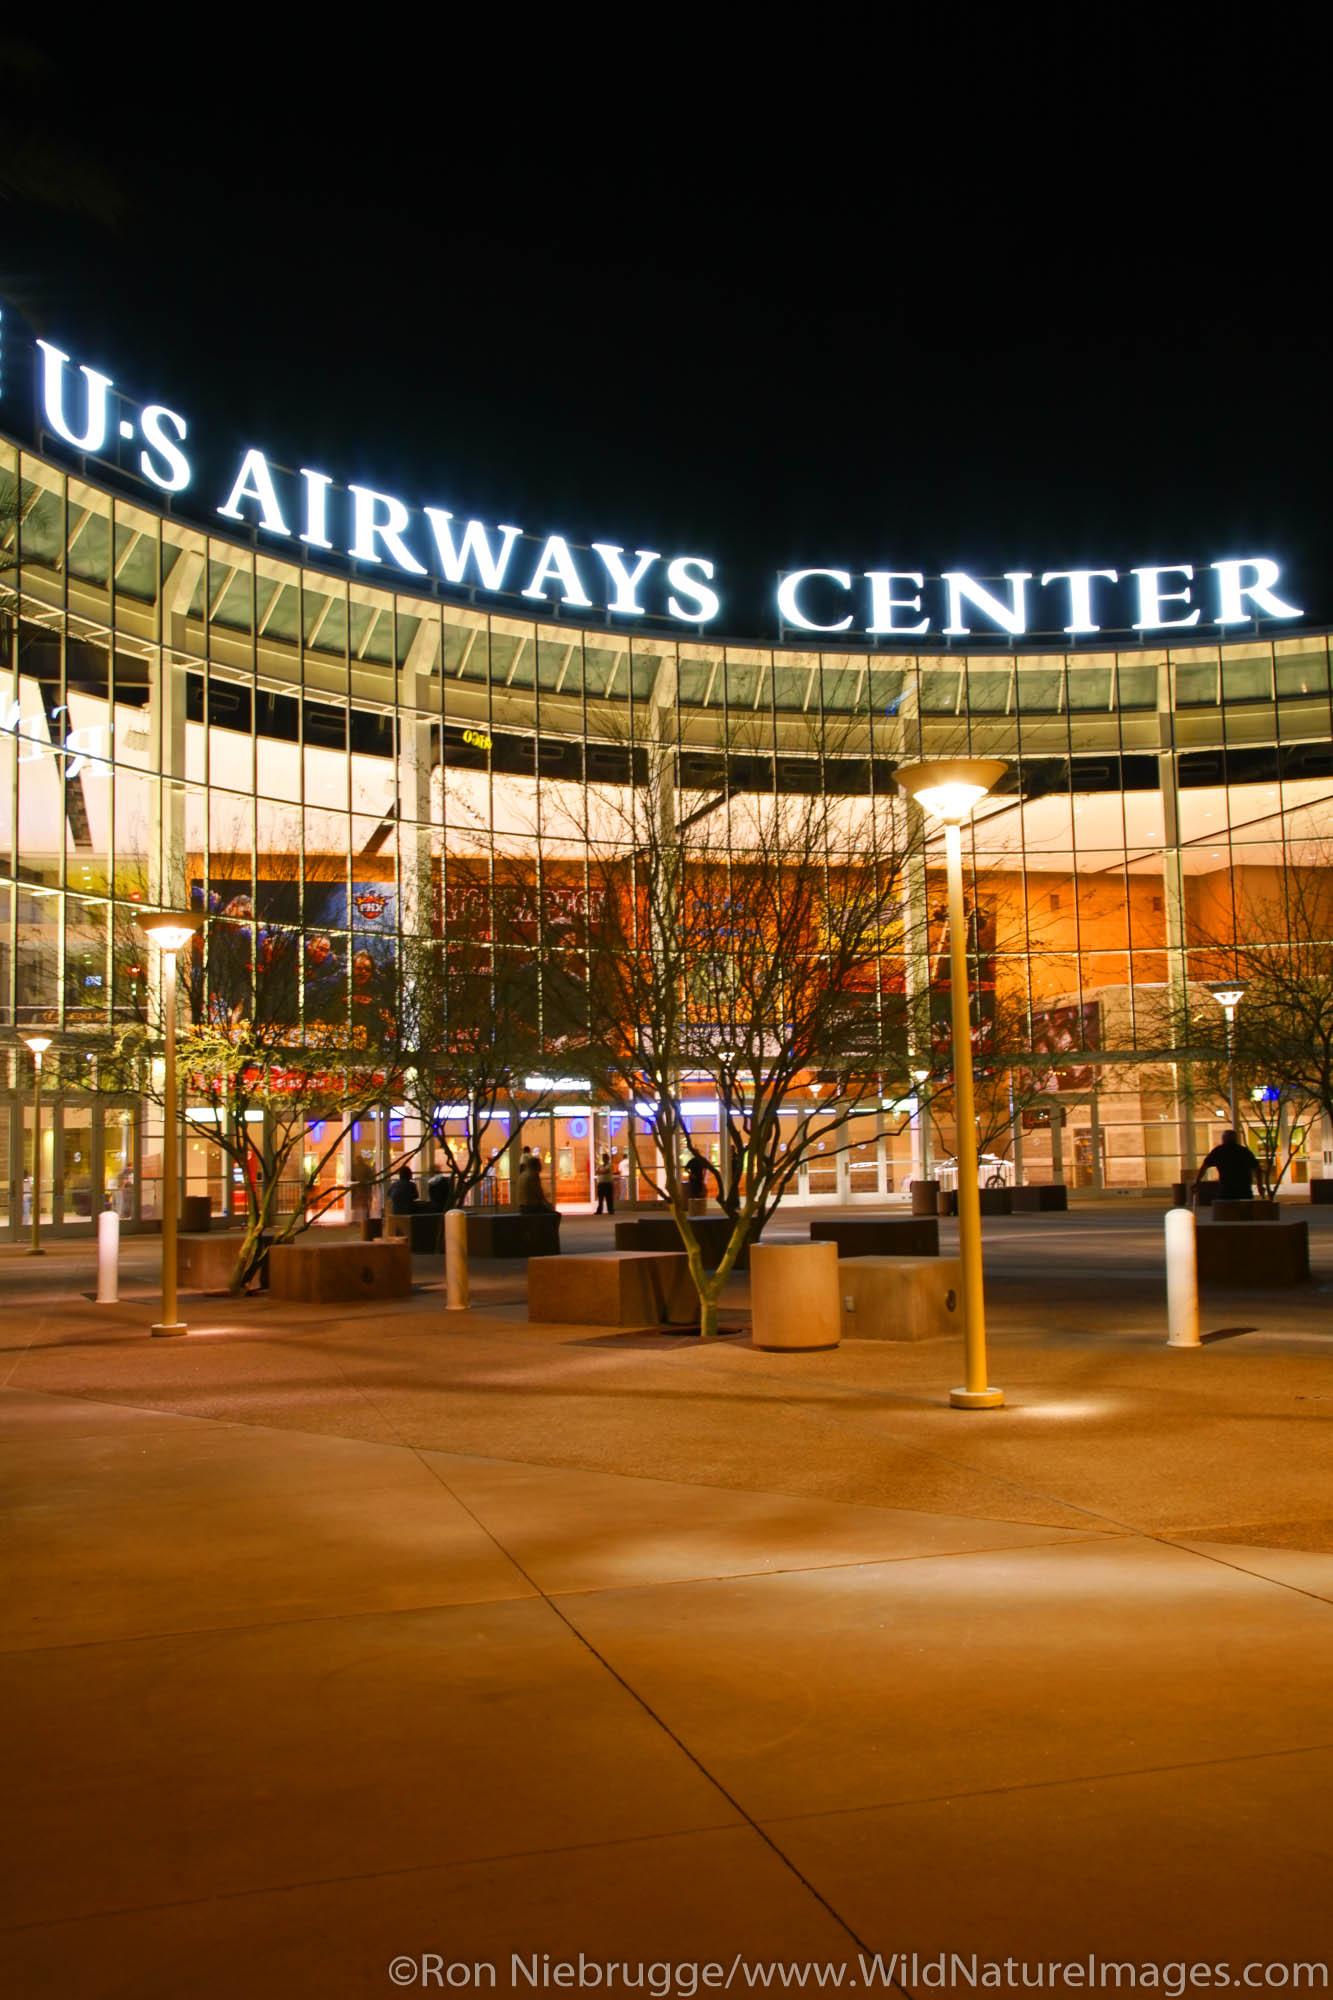 US Airways Center, downtown Phoenix, Arizona.